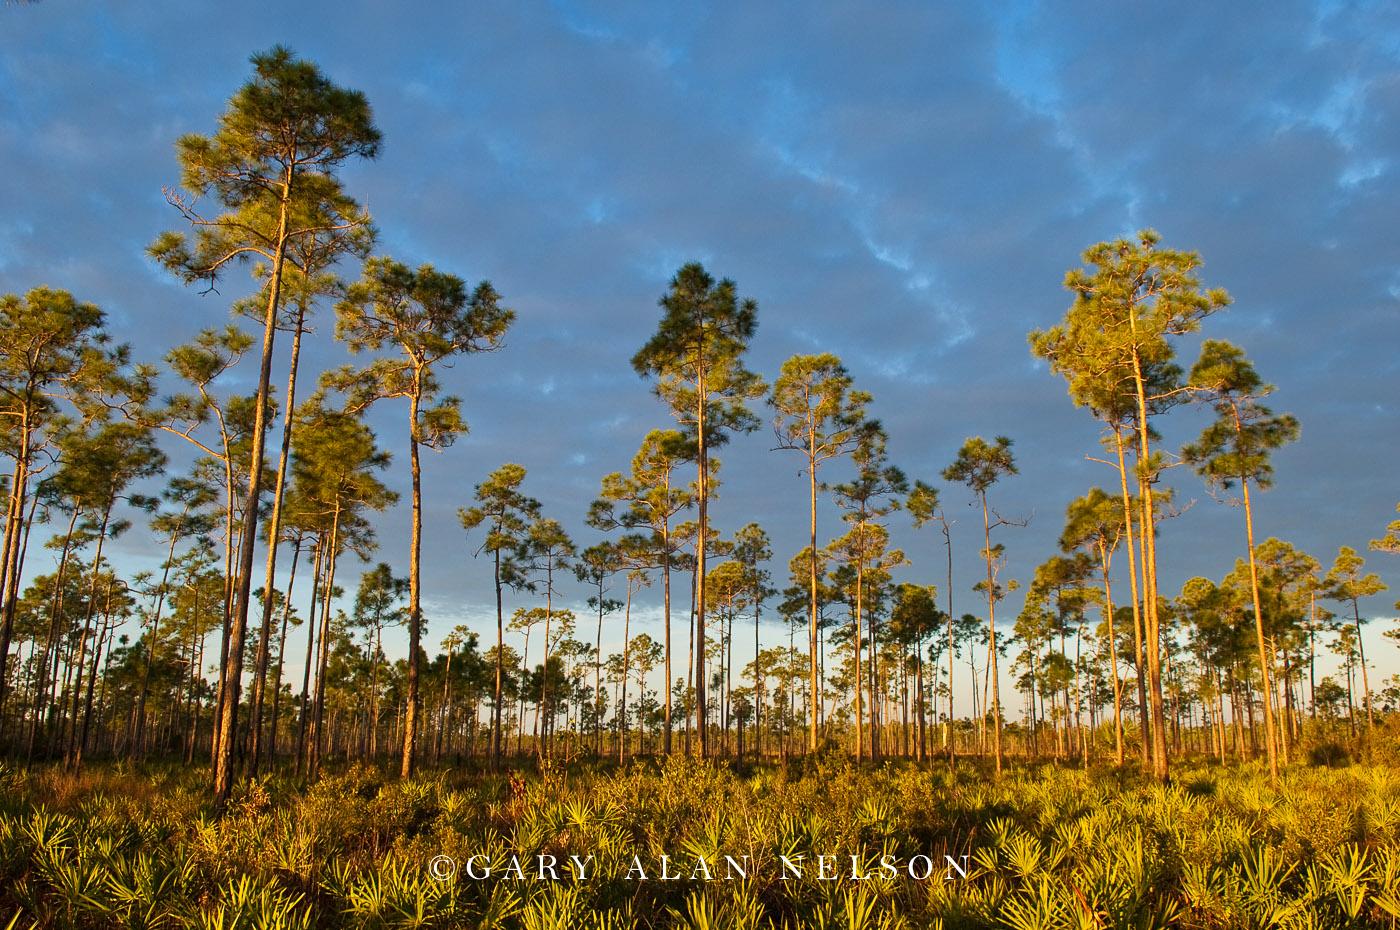 florida, everglades national park, slash pines, palmetto plants, photo